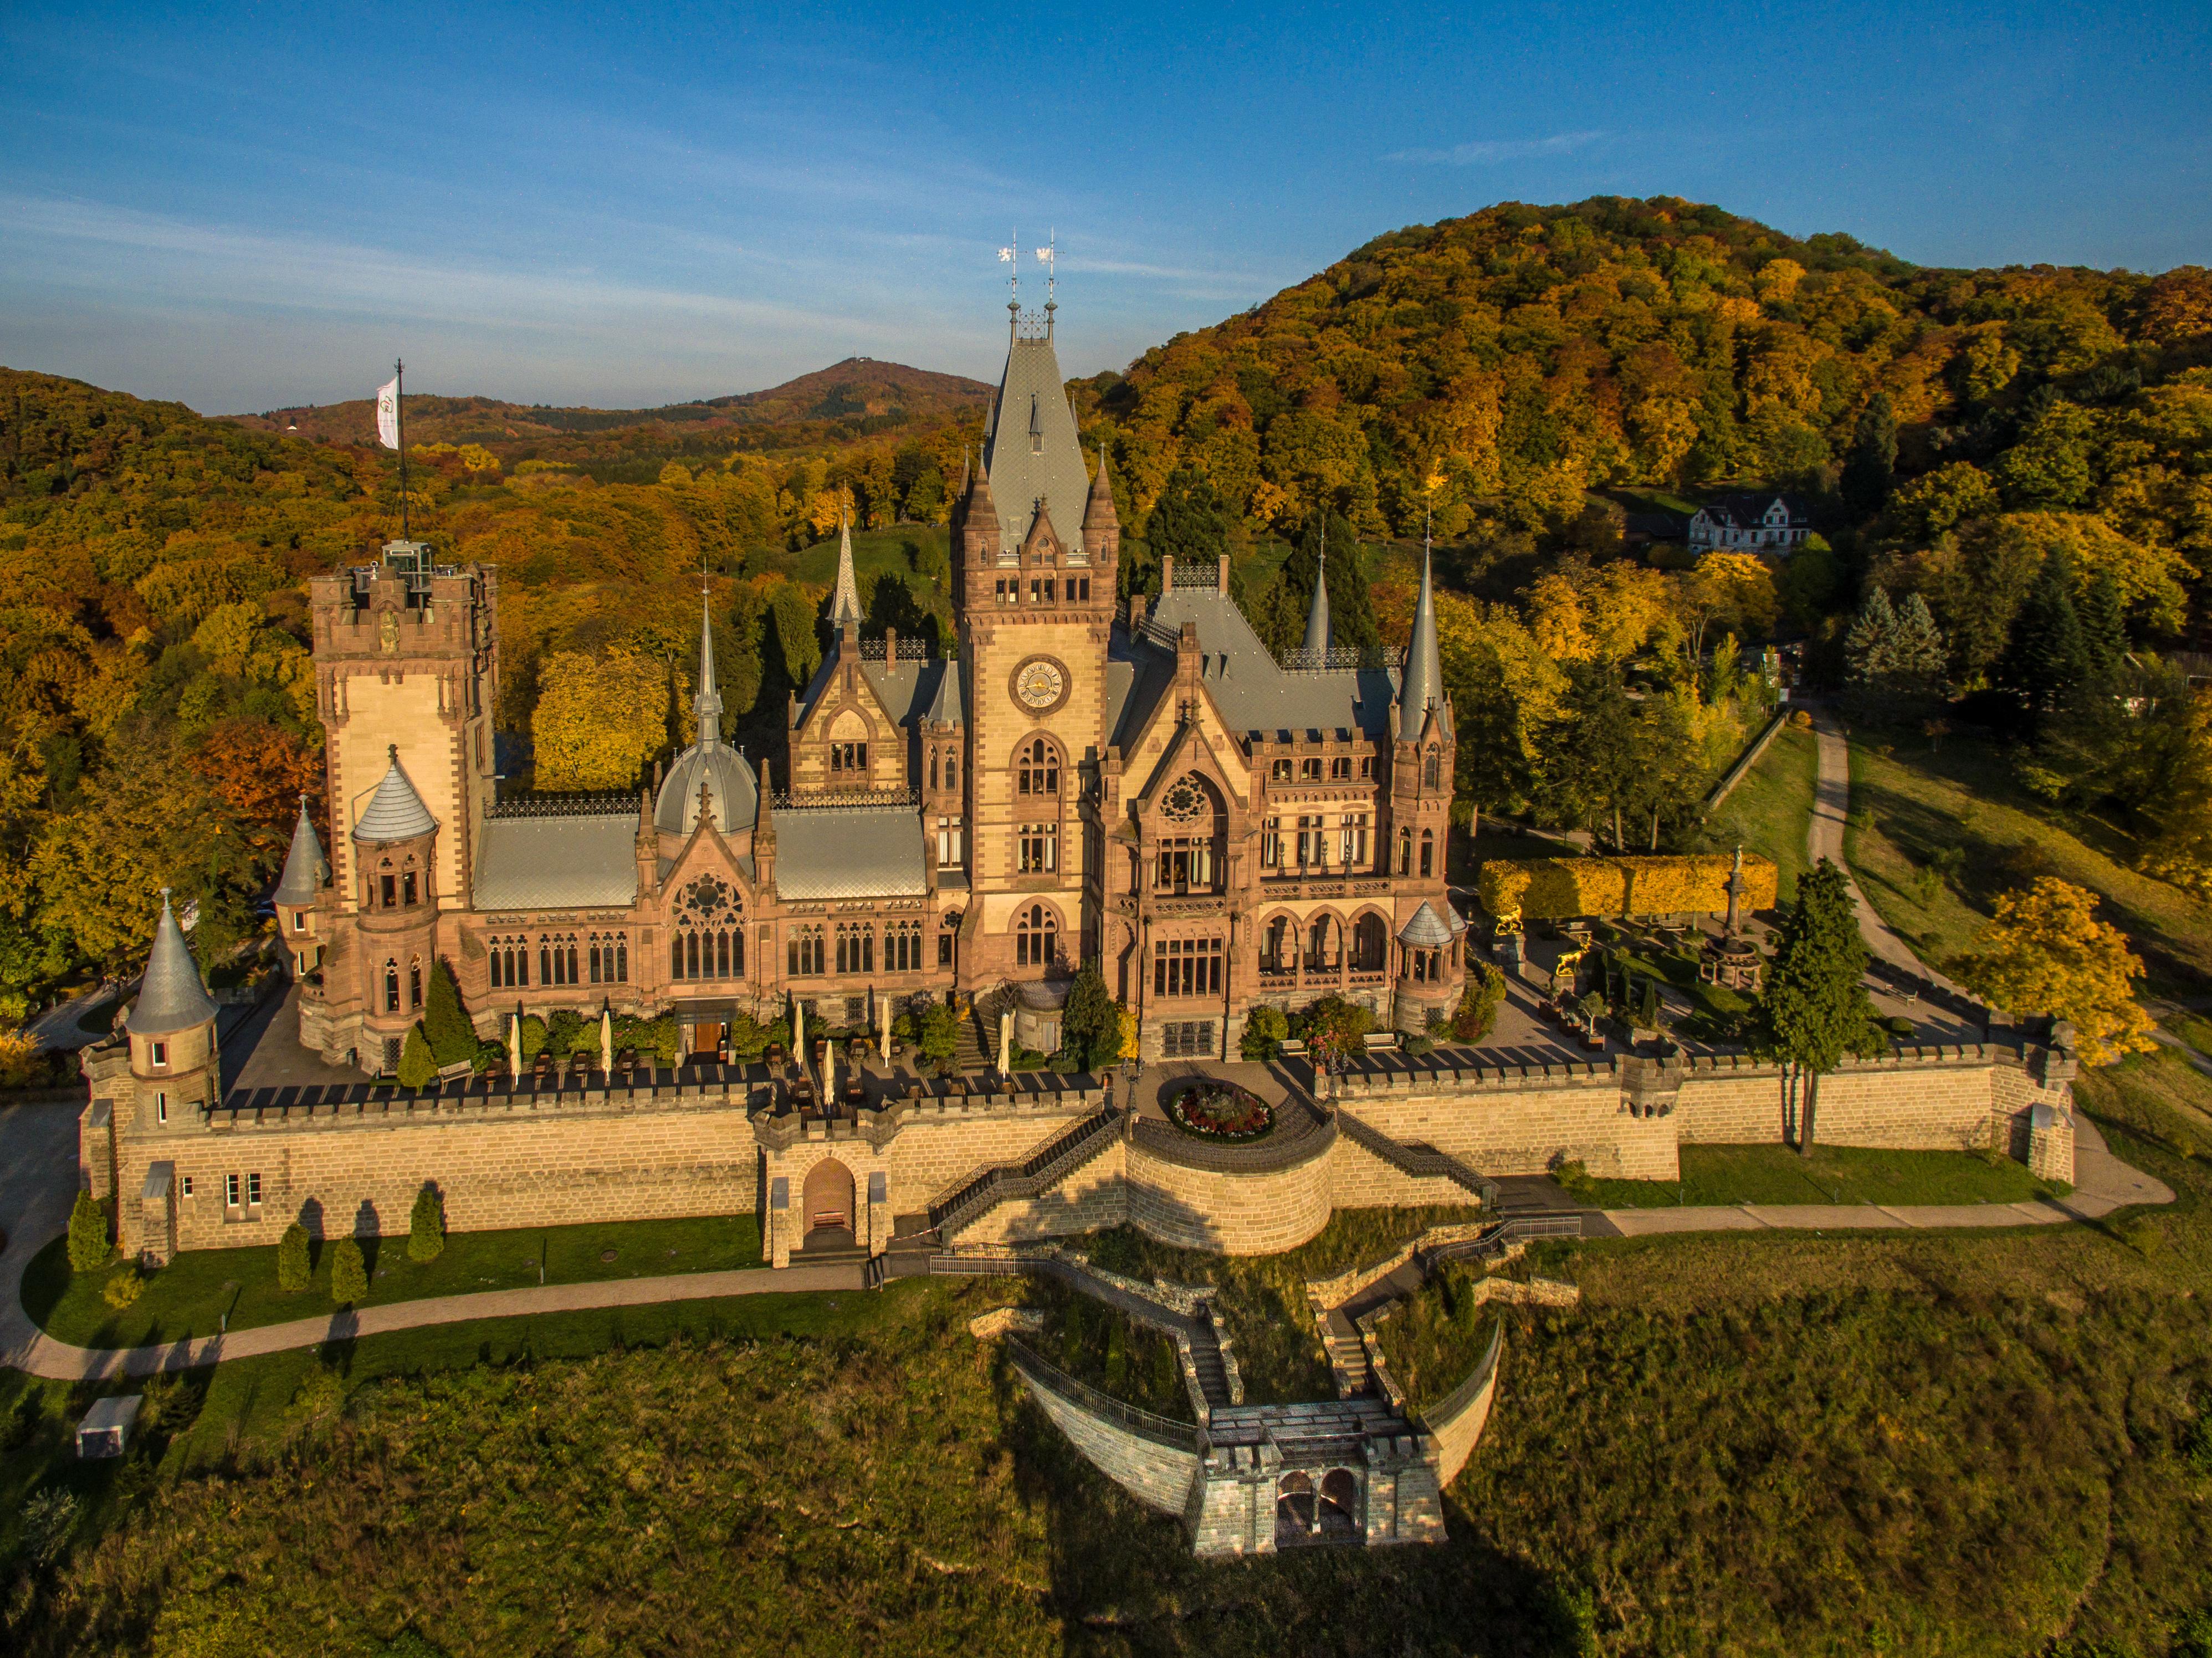 Schloss Drachenburg Bild 1.jpg